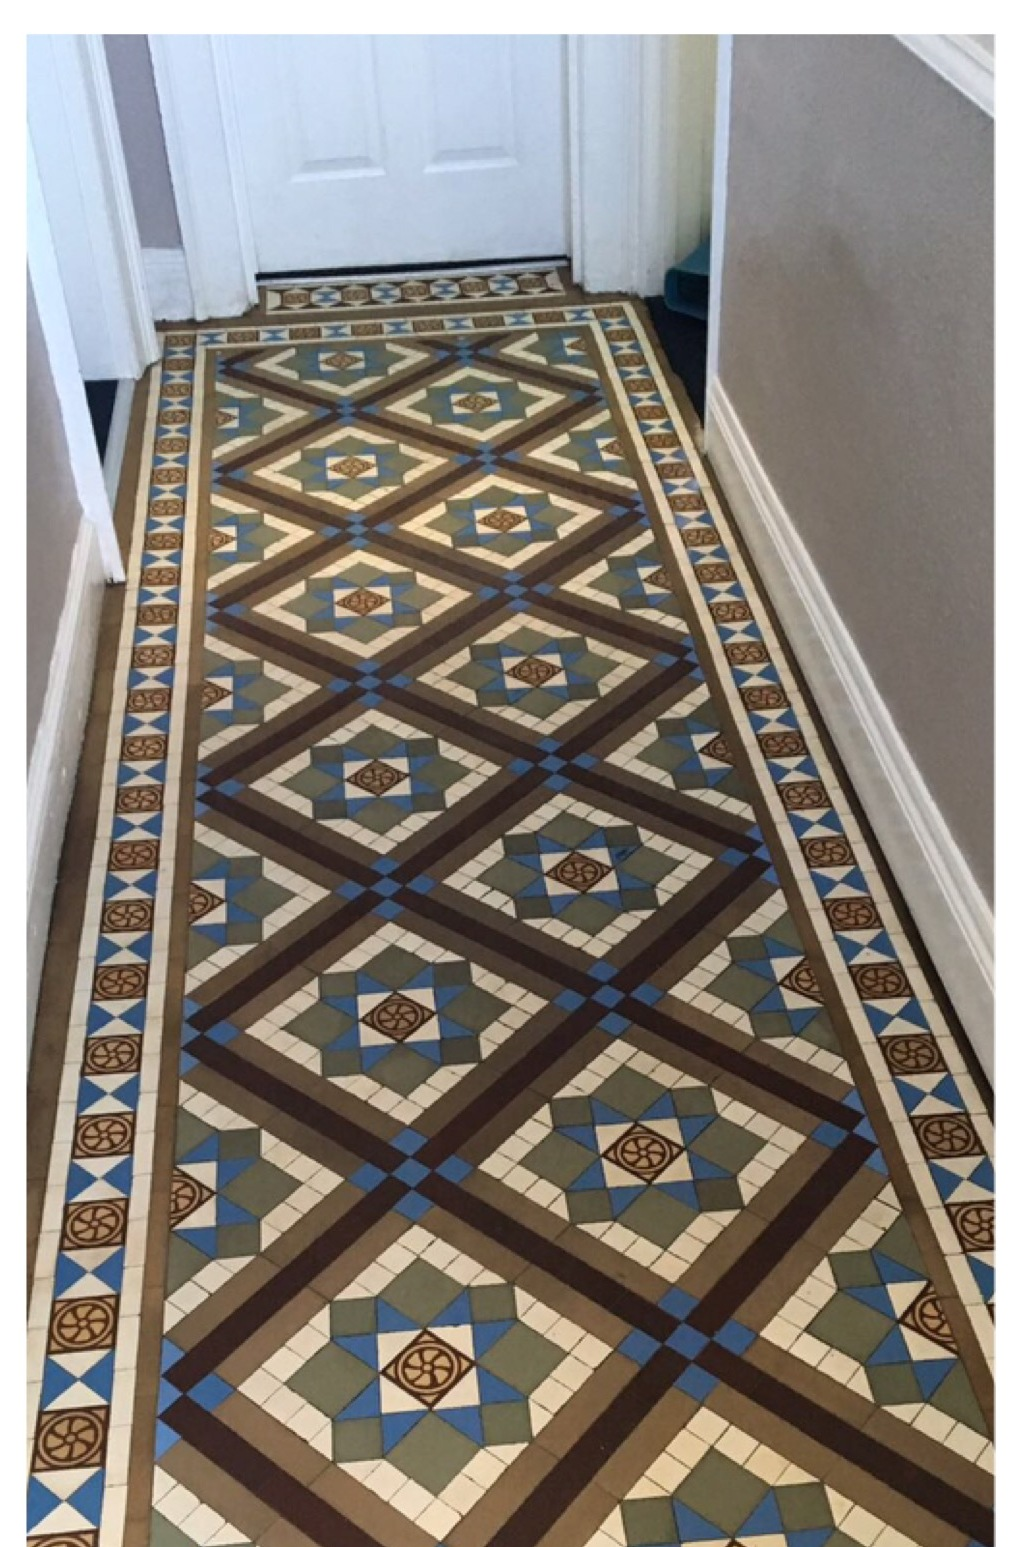 Edwardian Geometric Tiled Hallway Floor Newark After Cleaning